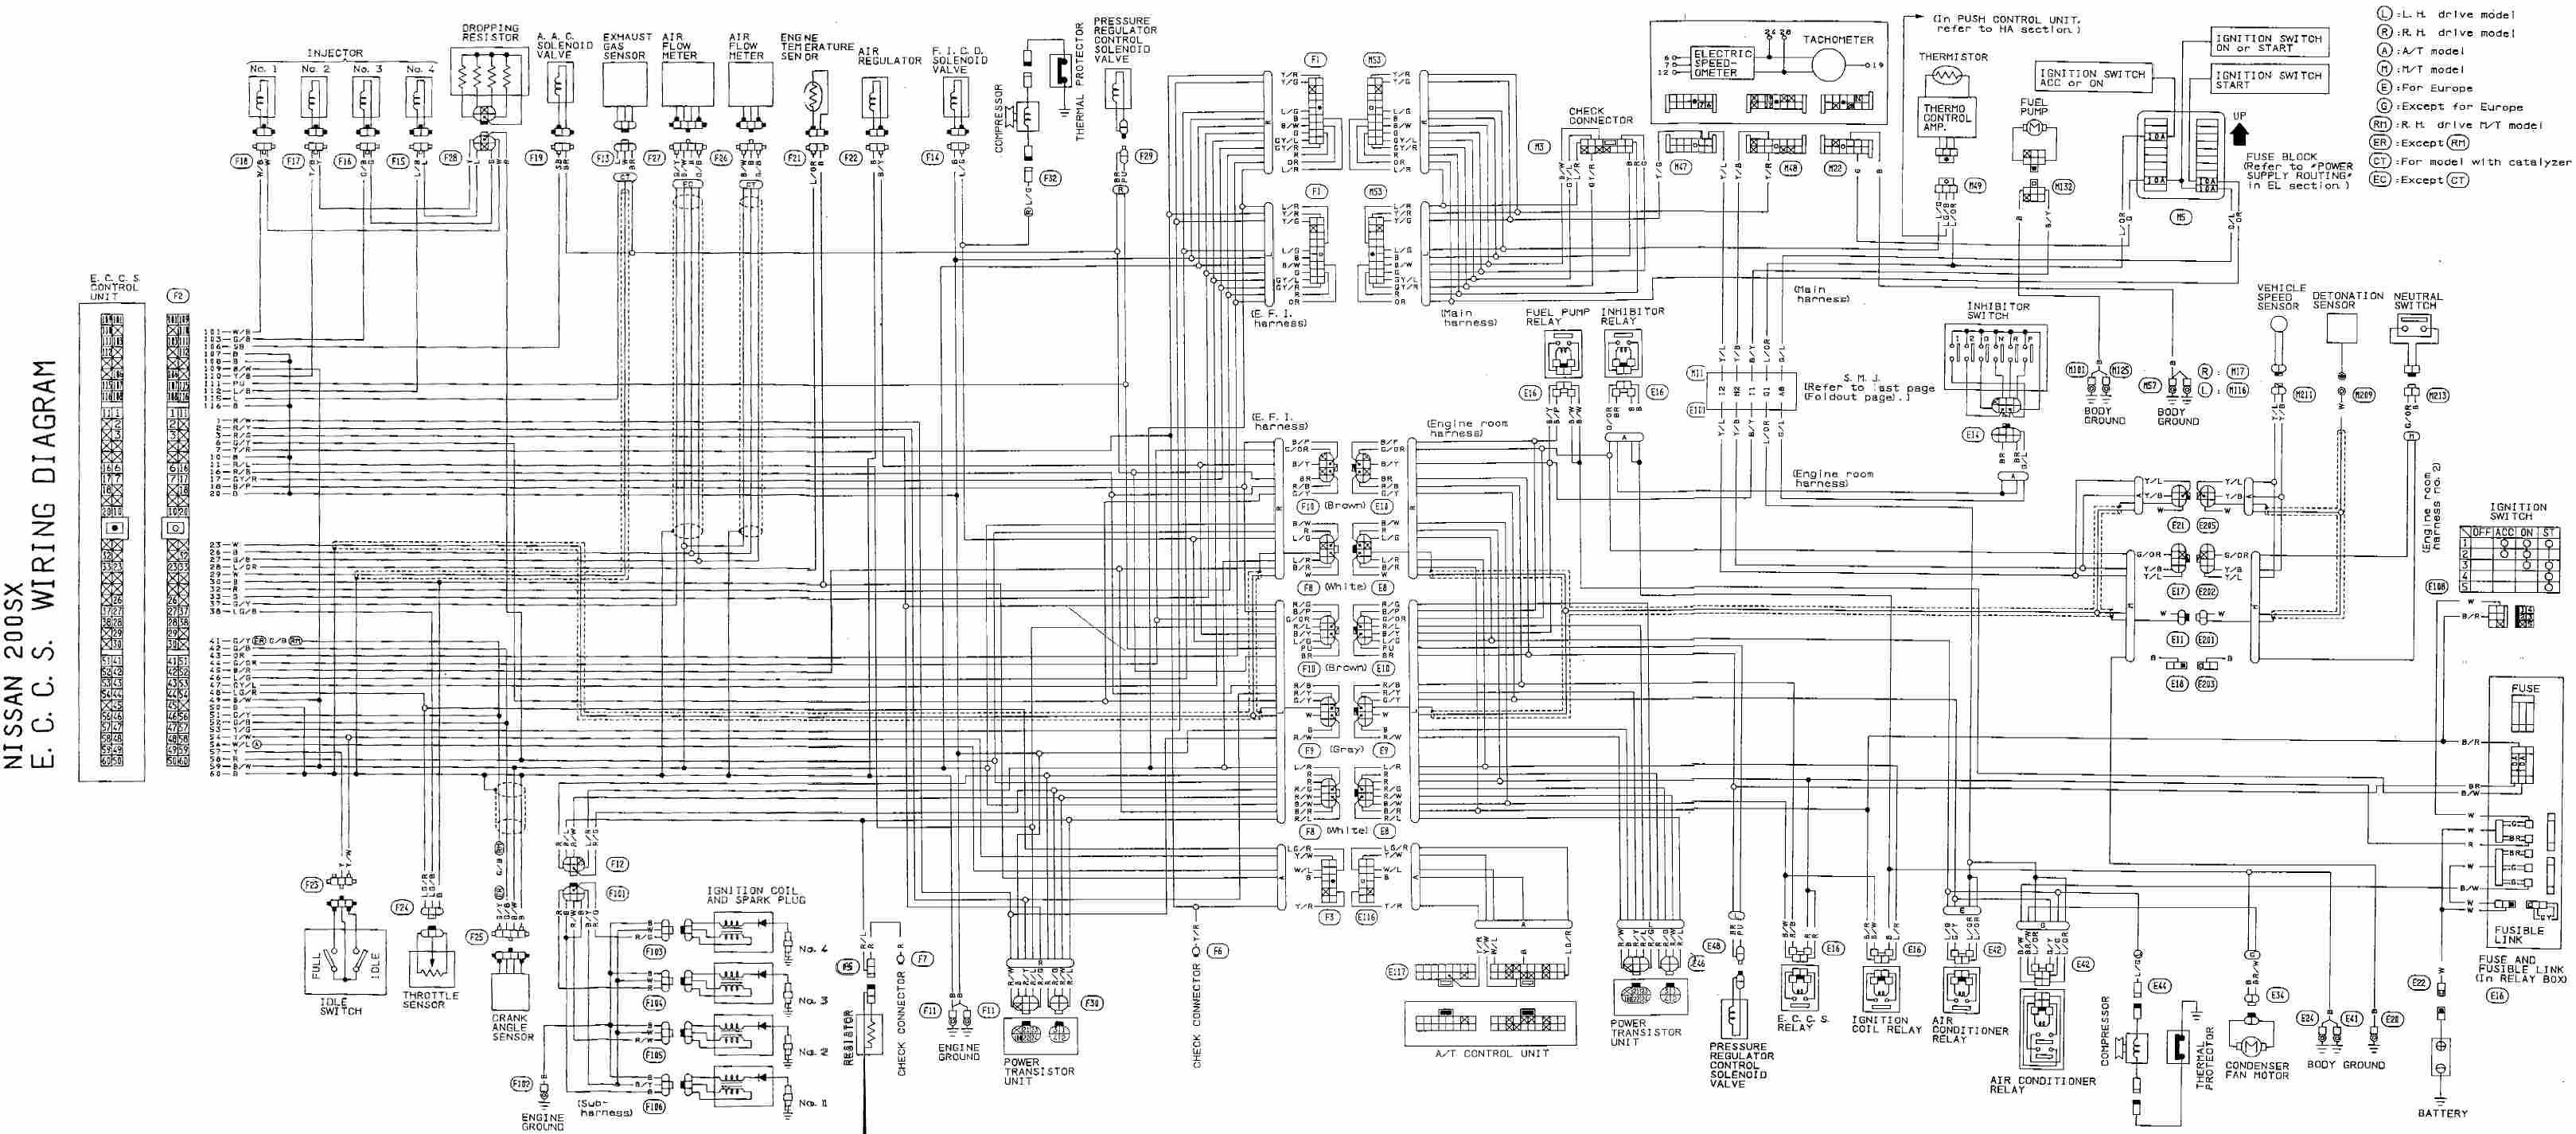 2014 nissan nv stereo wiring diagram wiring librarynissan wiring diagram wiring diagrams box nissan lighting wiring [ 3237 x 1425 Pixel ]